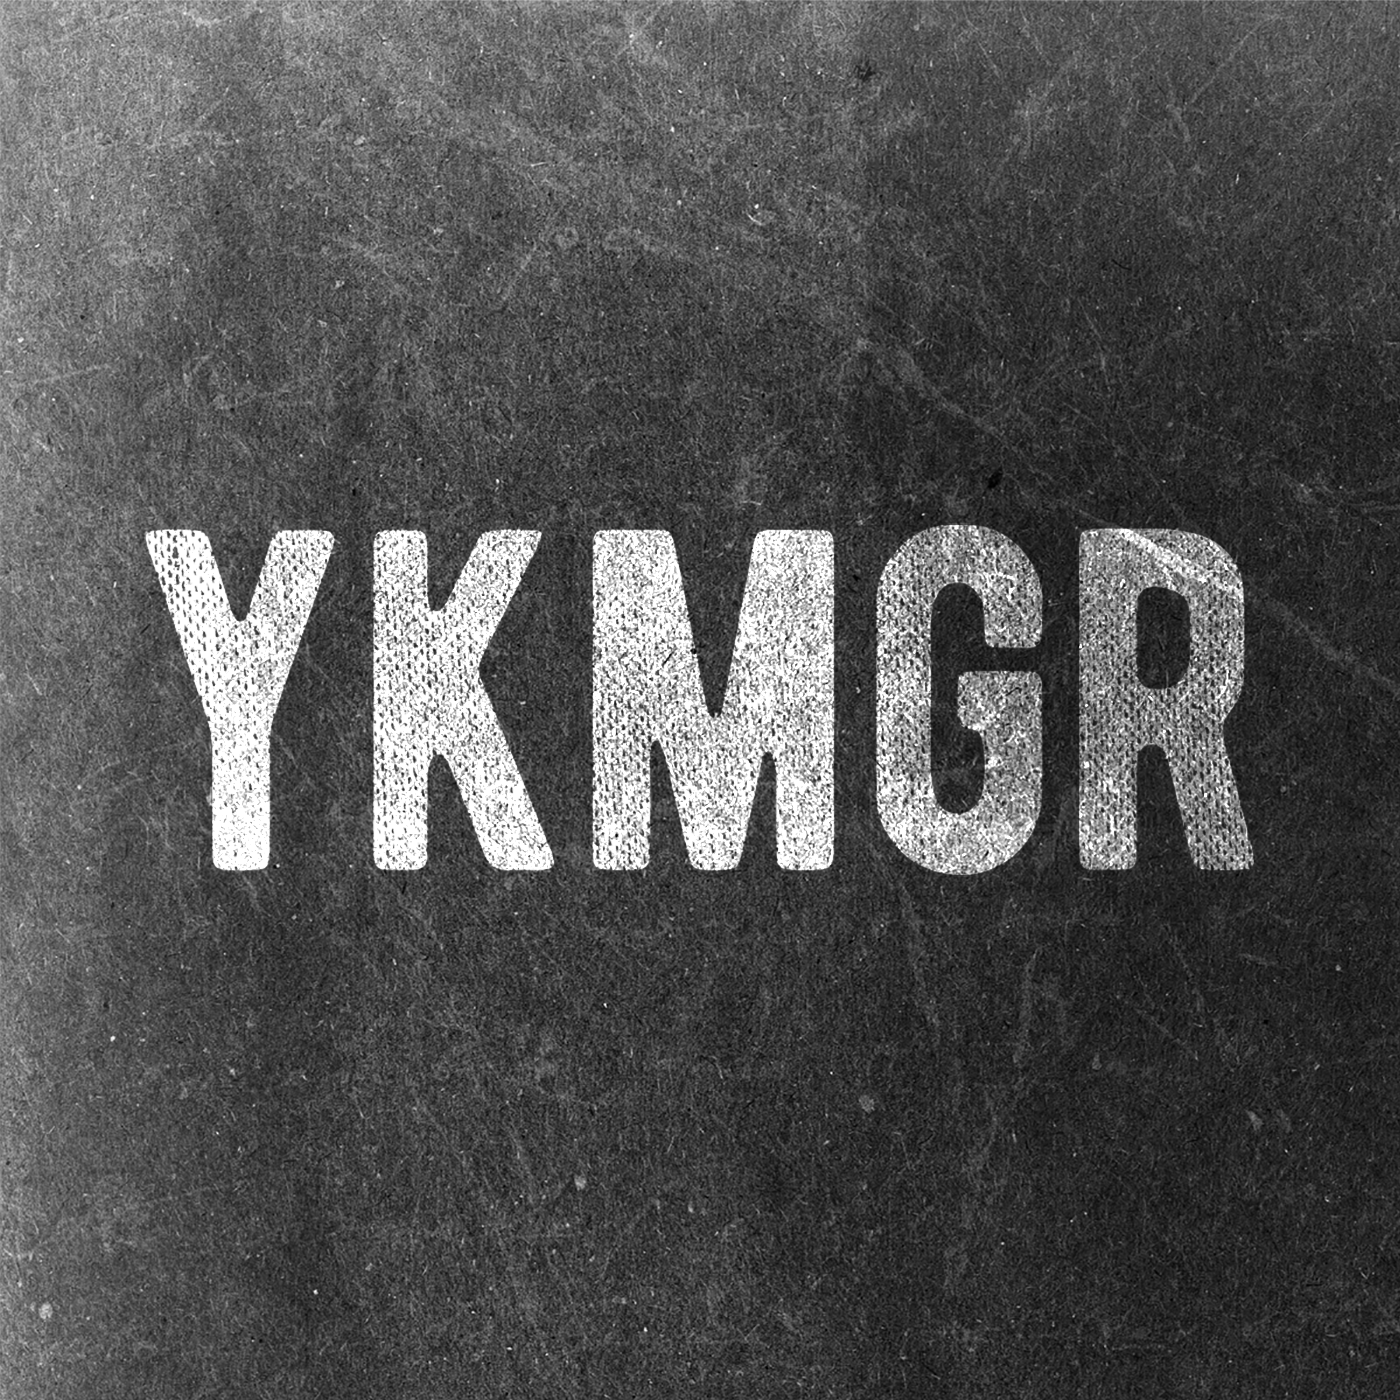 YKMGR.png